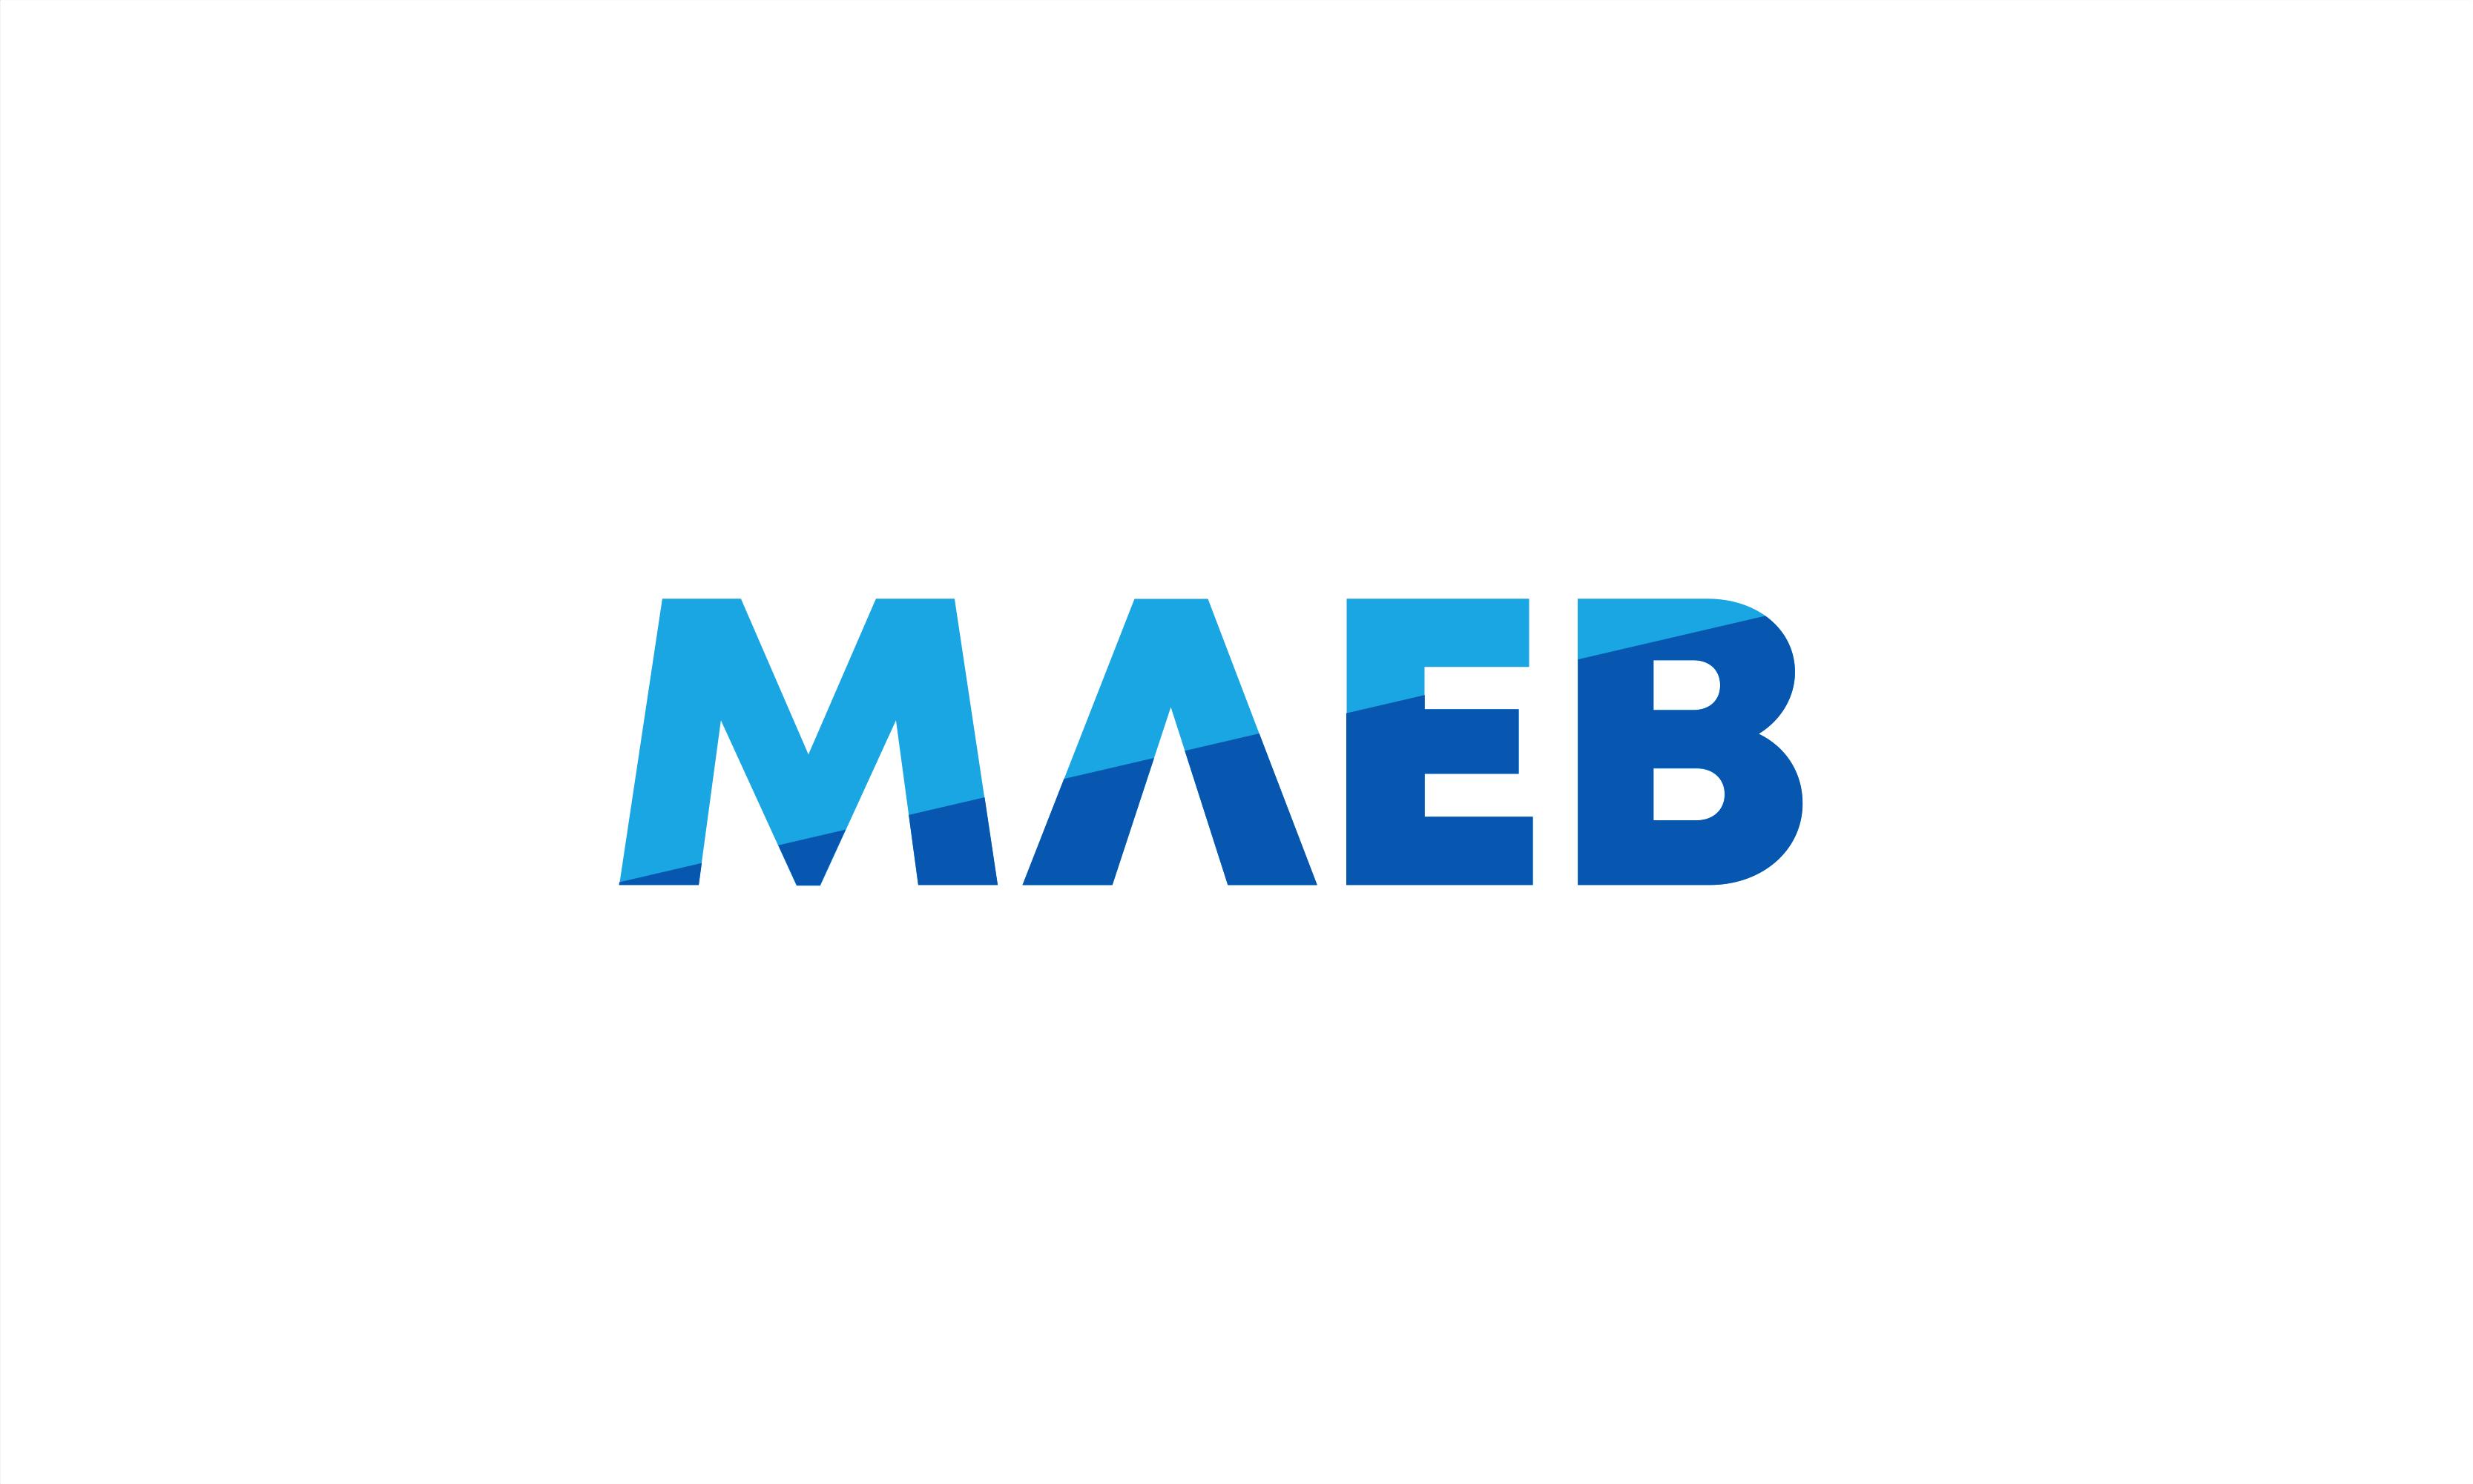 maeb logo